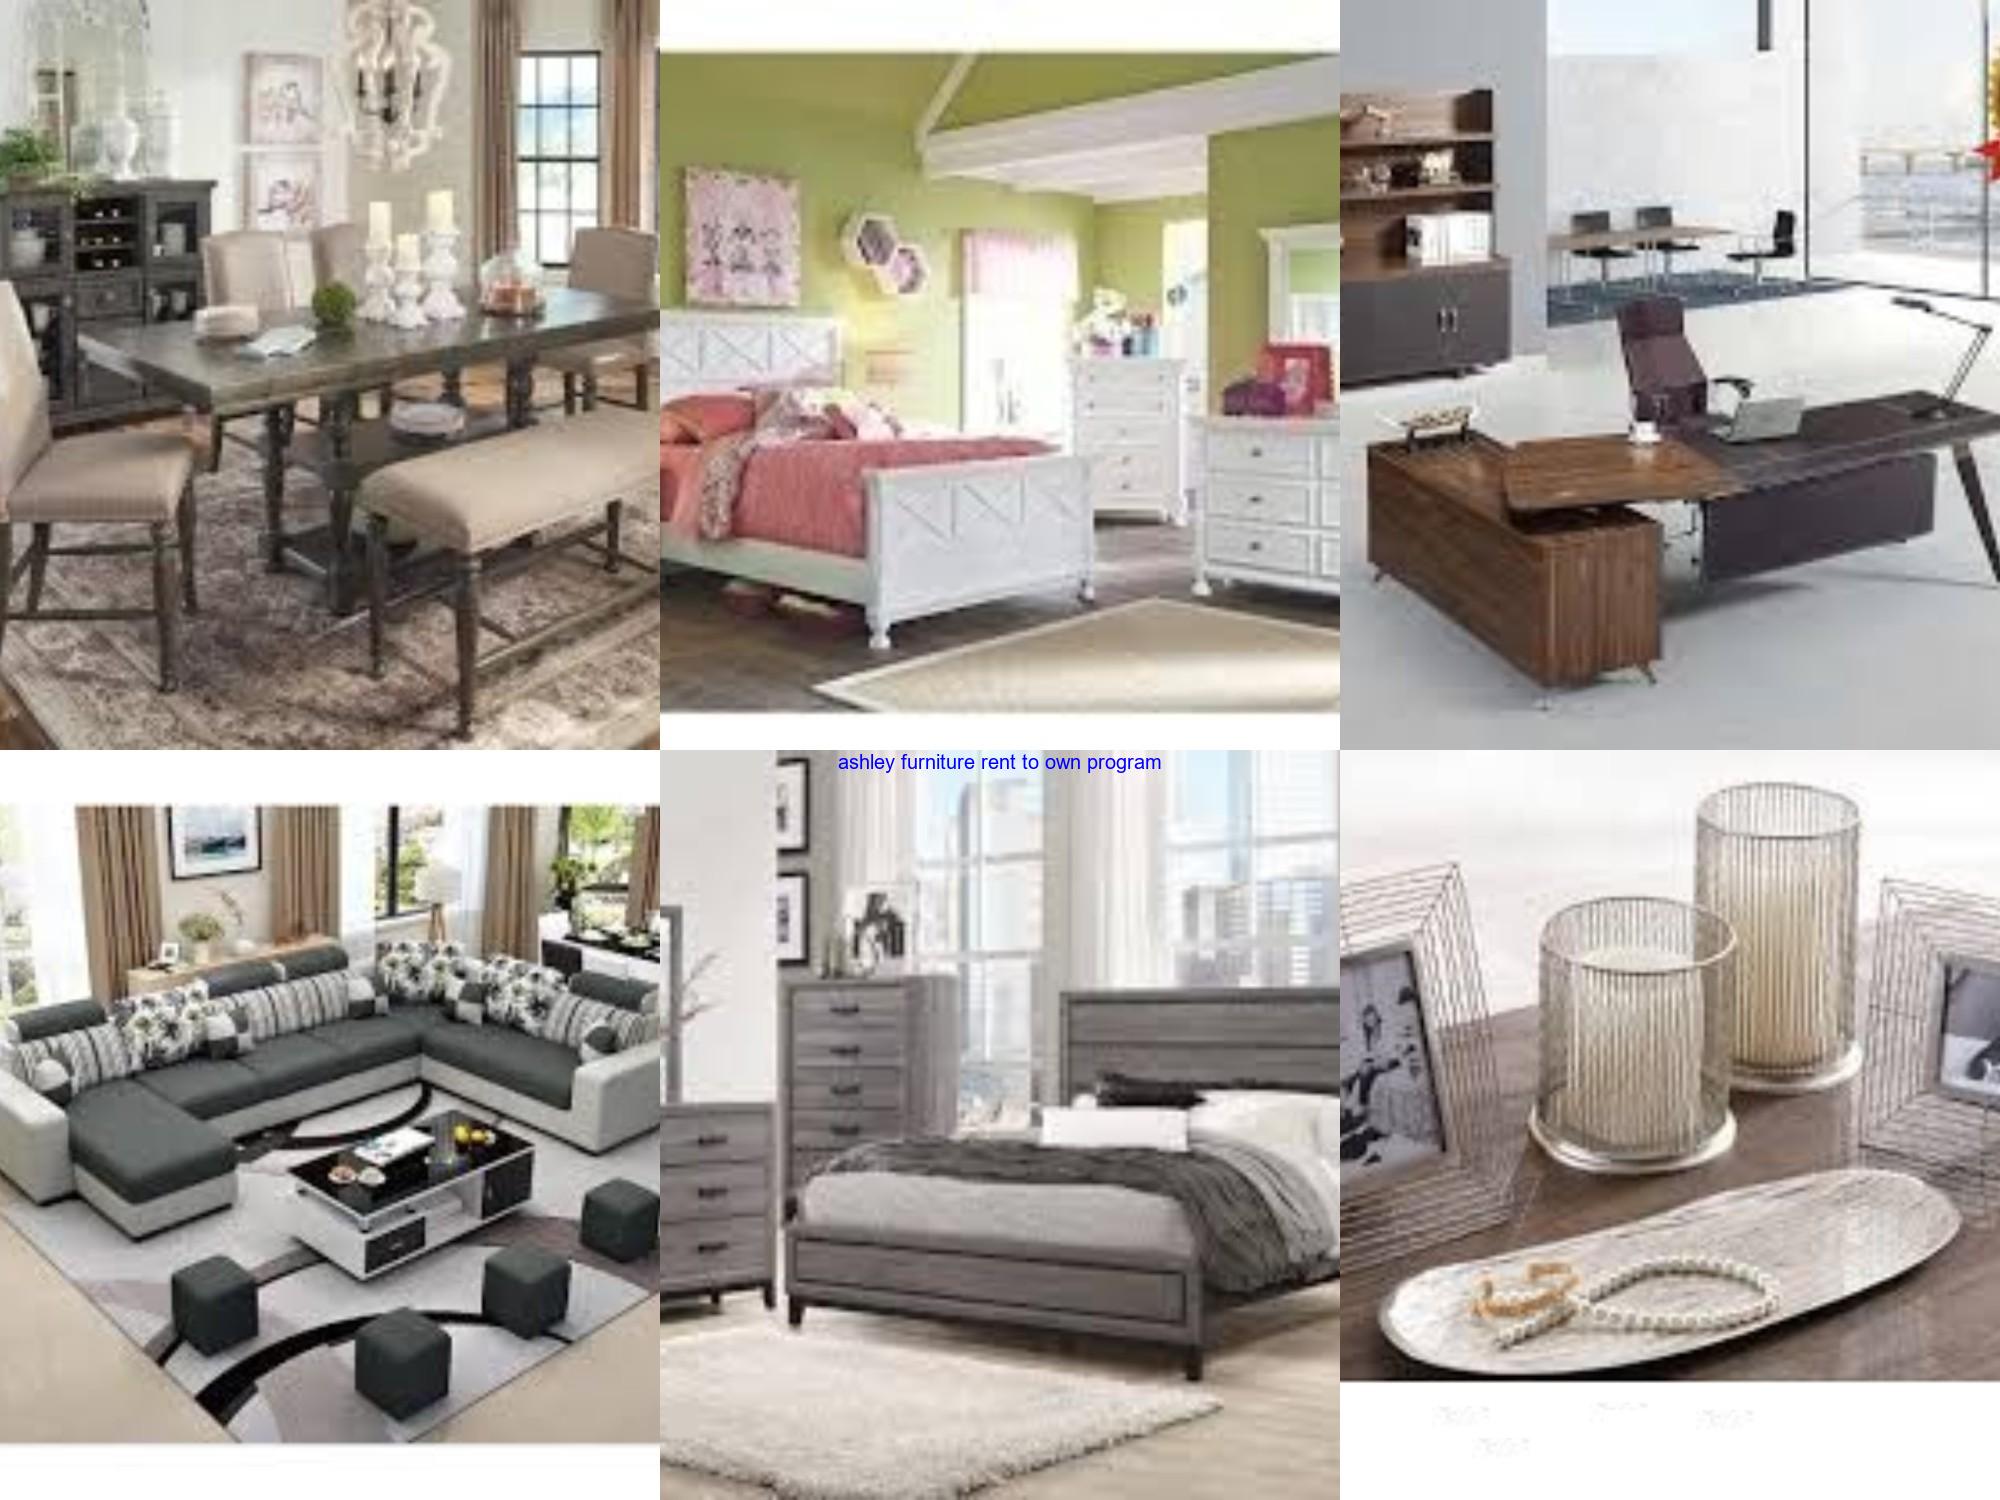 Ashley Furniture Rent To Own Program Furniture Prices Ashley Furniture Wholesale Furniture